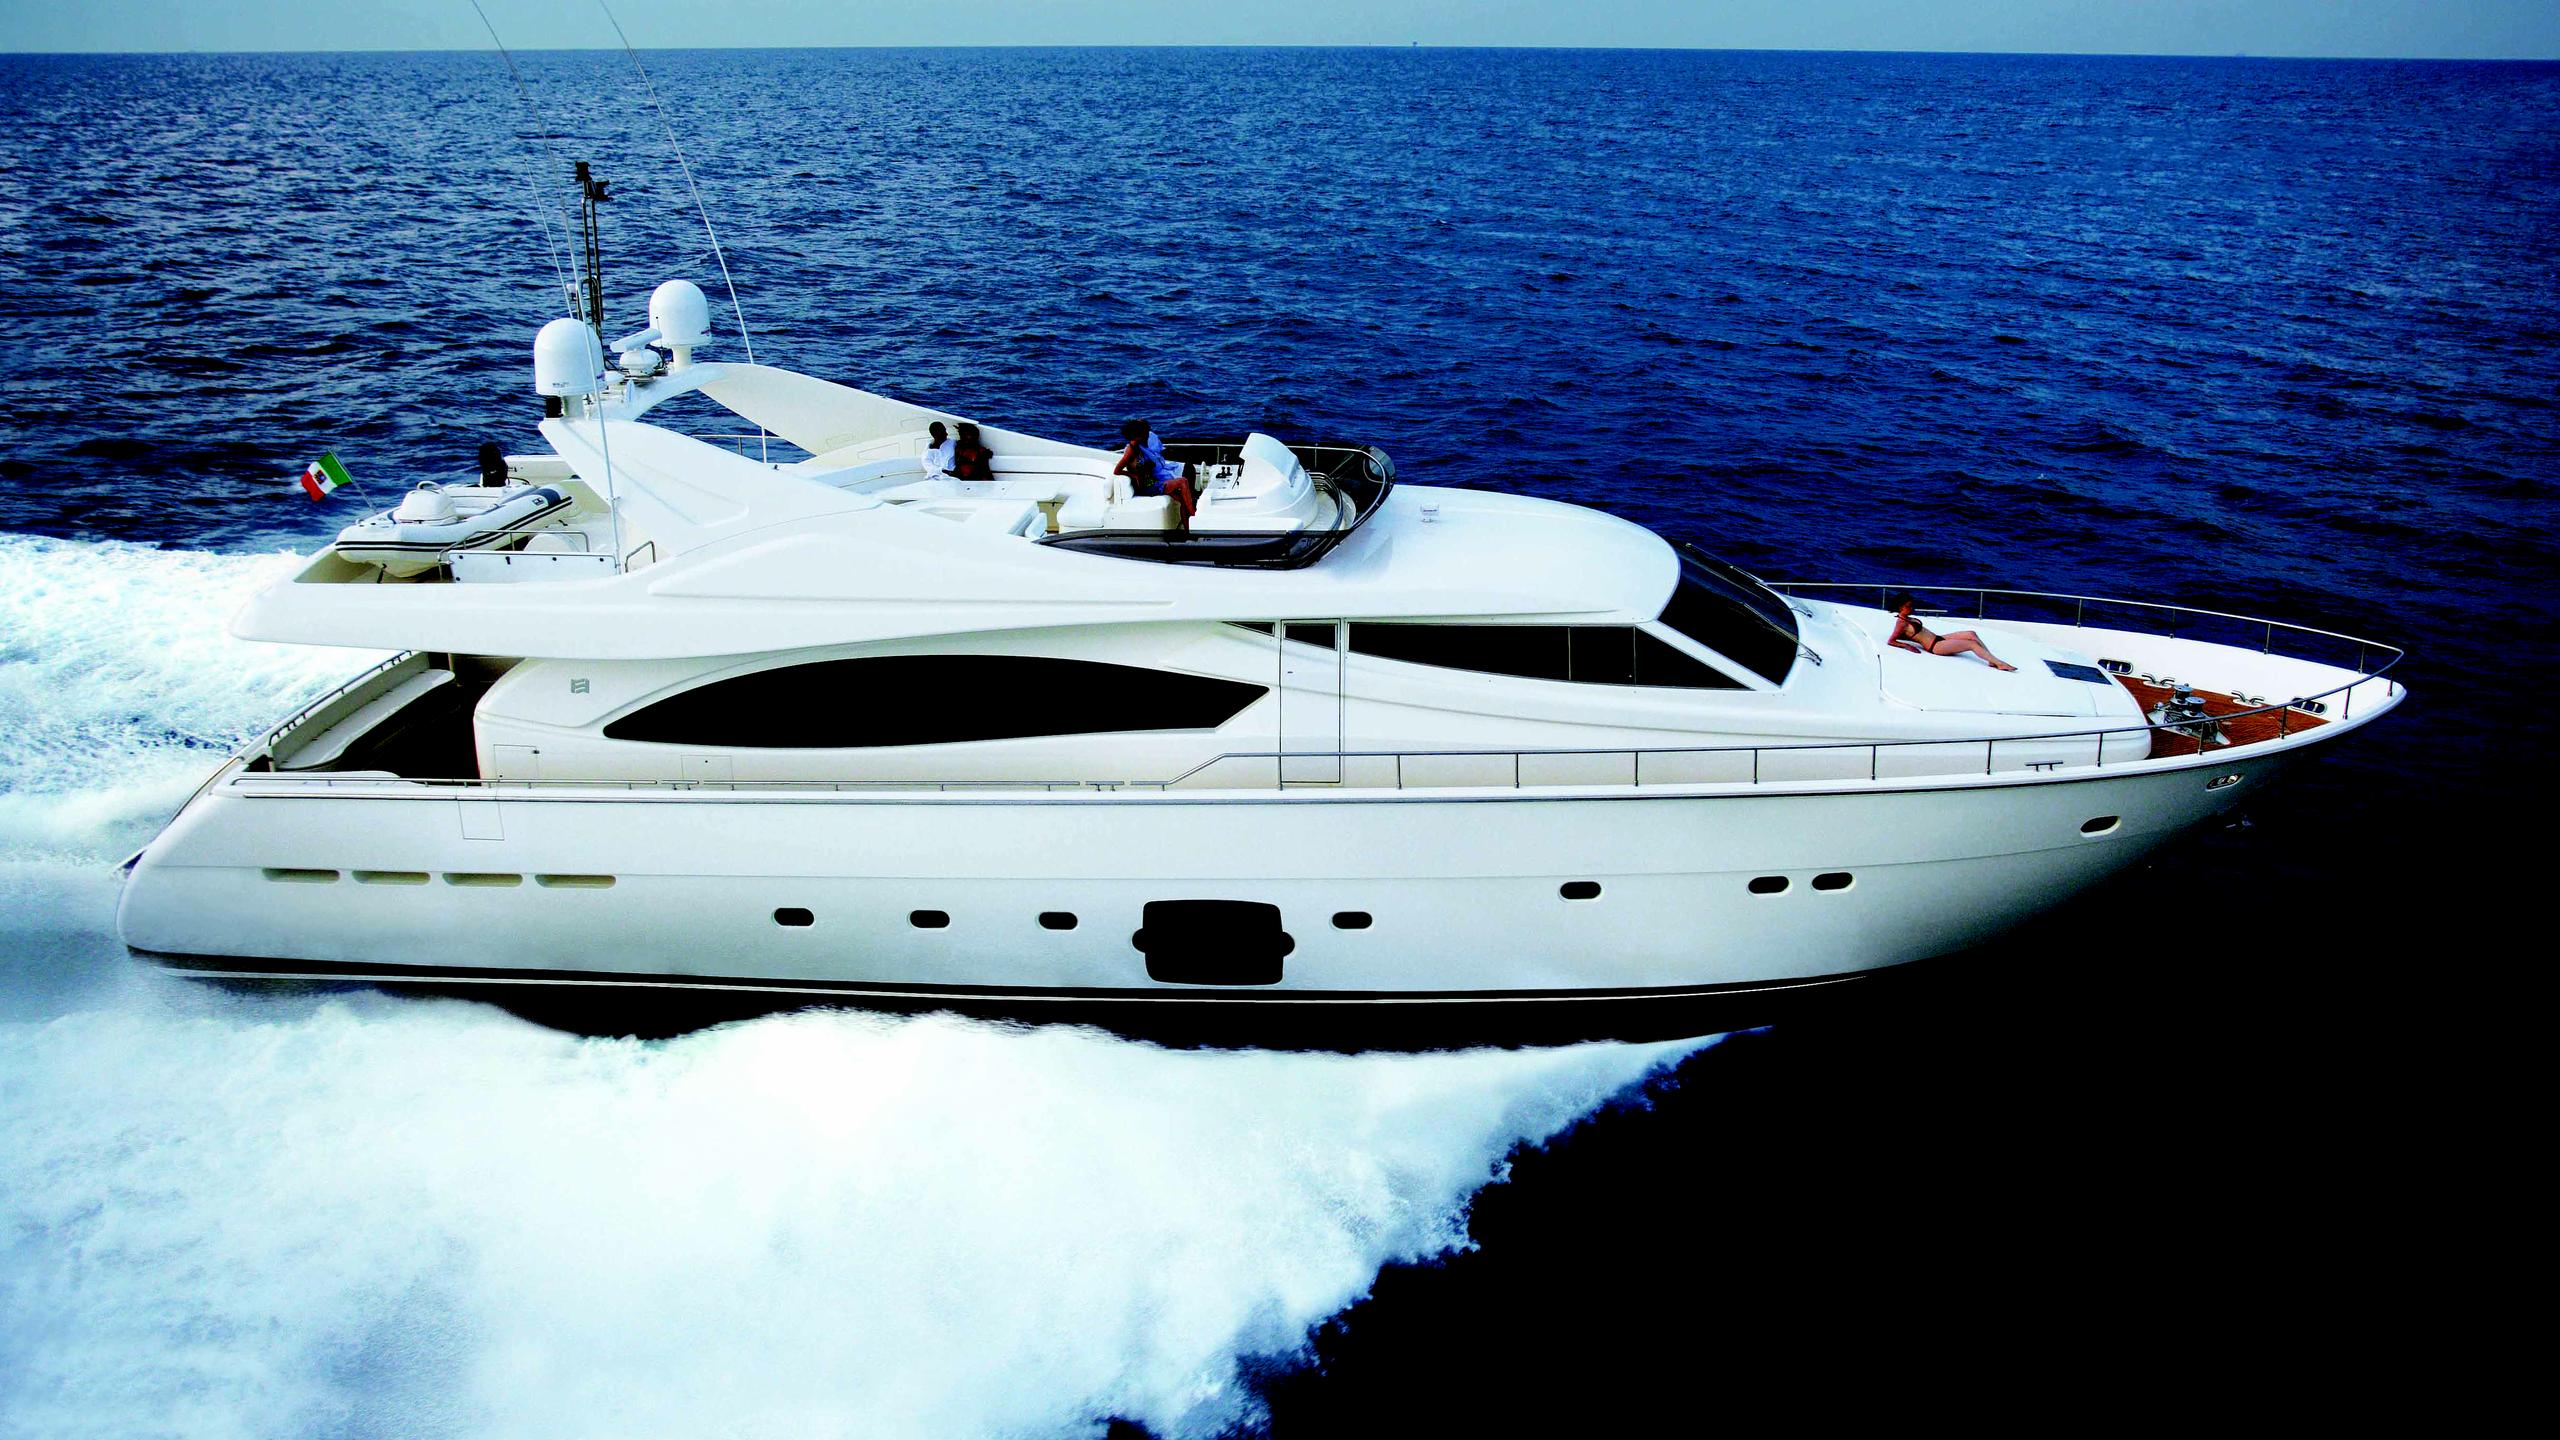 martinica-motor-yacht-ferretti-880-2003-27m-cruising